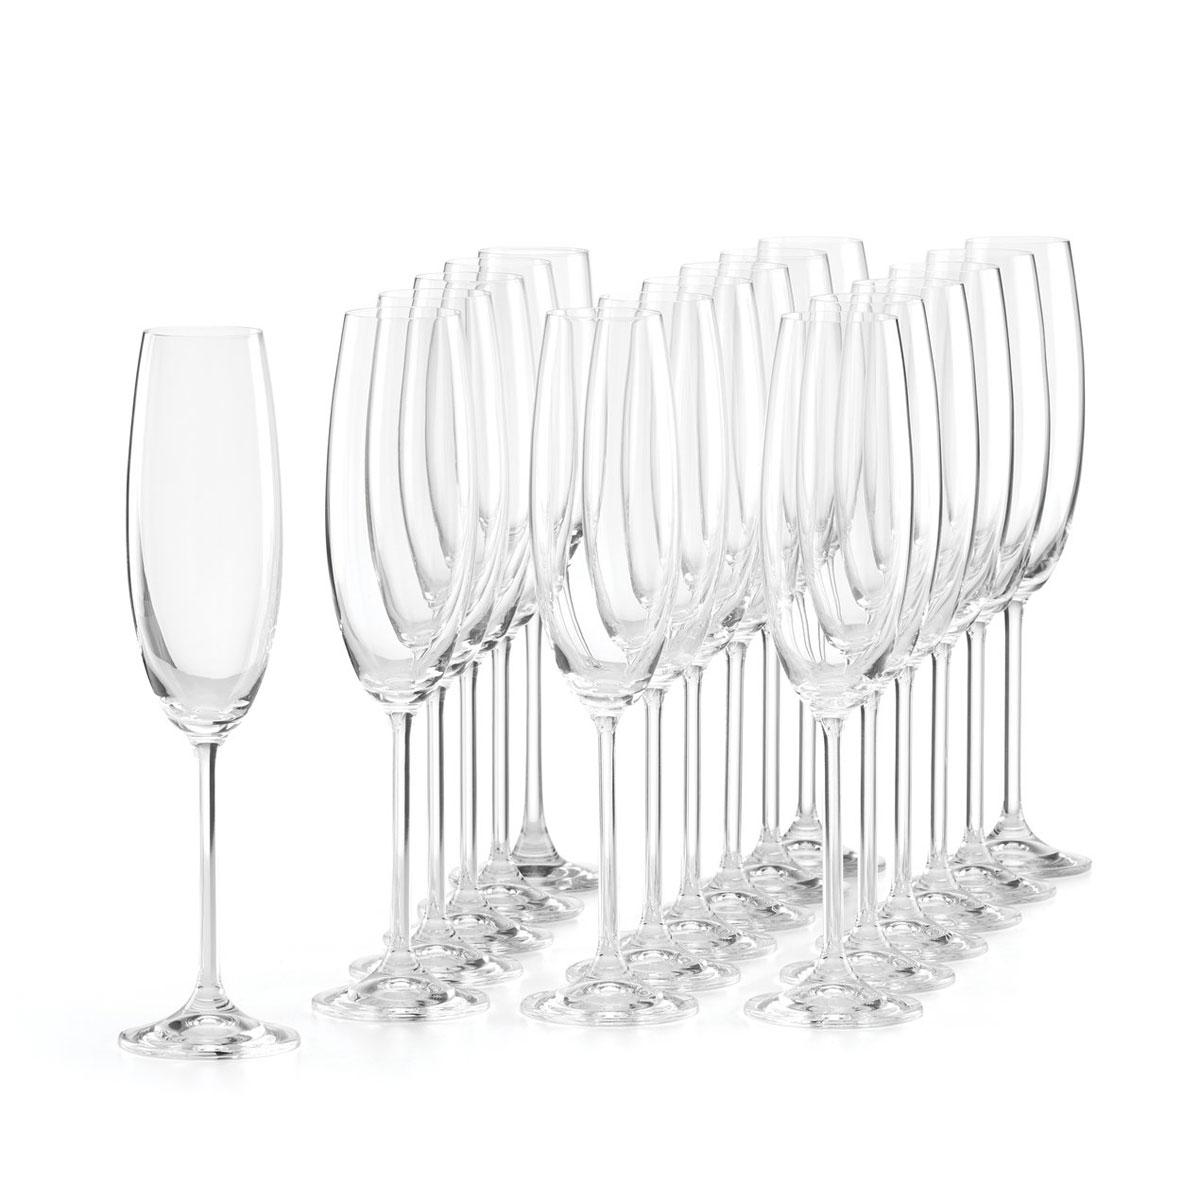 Lenox Tuscany Classics Party Champagne Flutes, Set Of 18